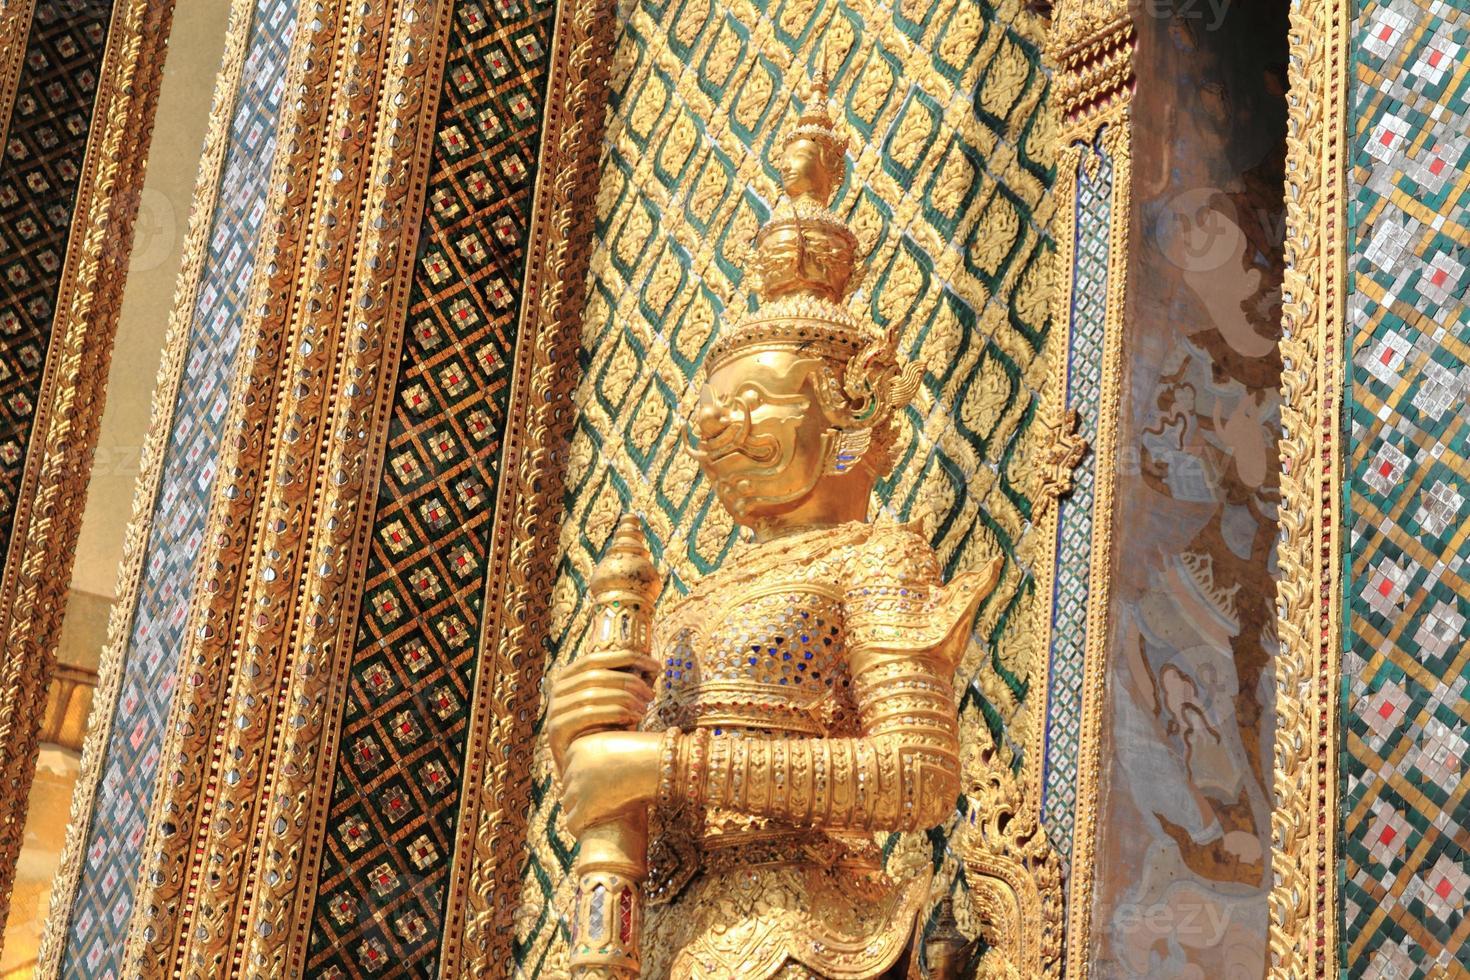 iaque no wat phra kaew em bangkok, Tailândia foto